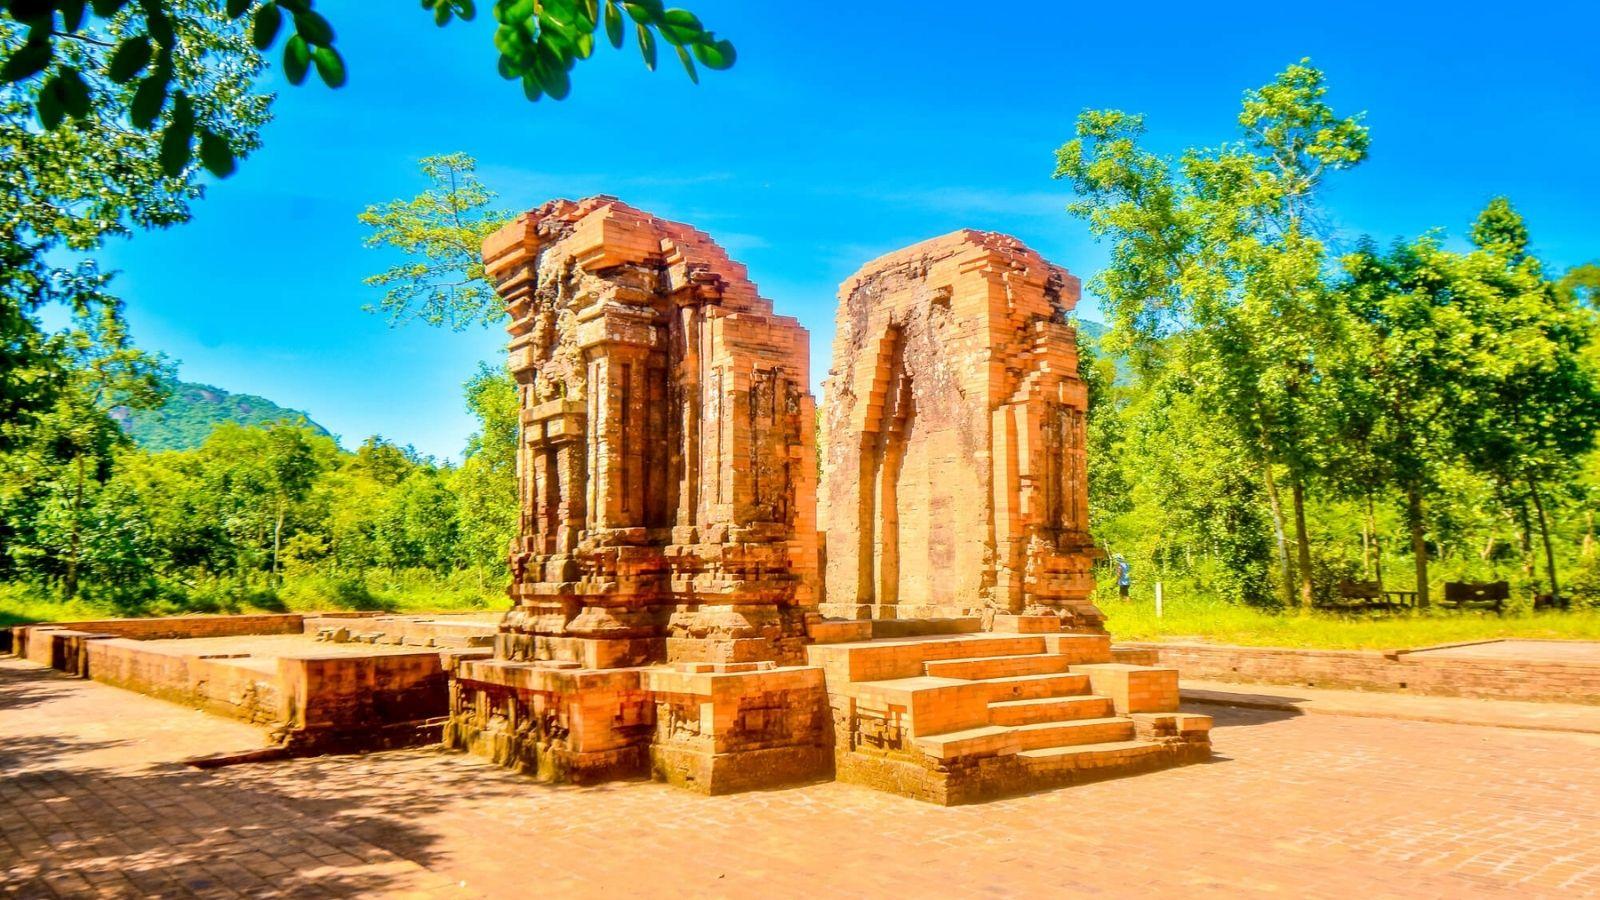 My Son holly land - Thailand Cambodia Vietnam 2 weeks itinerary